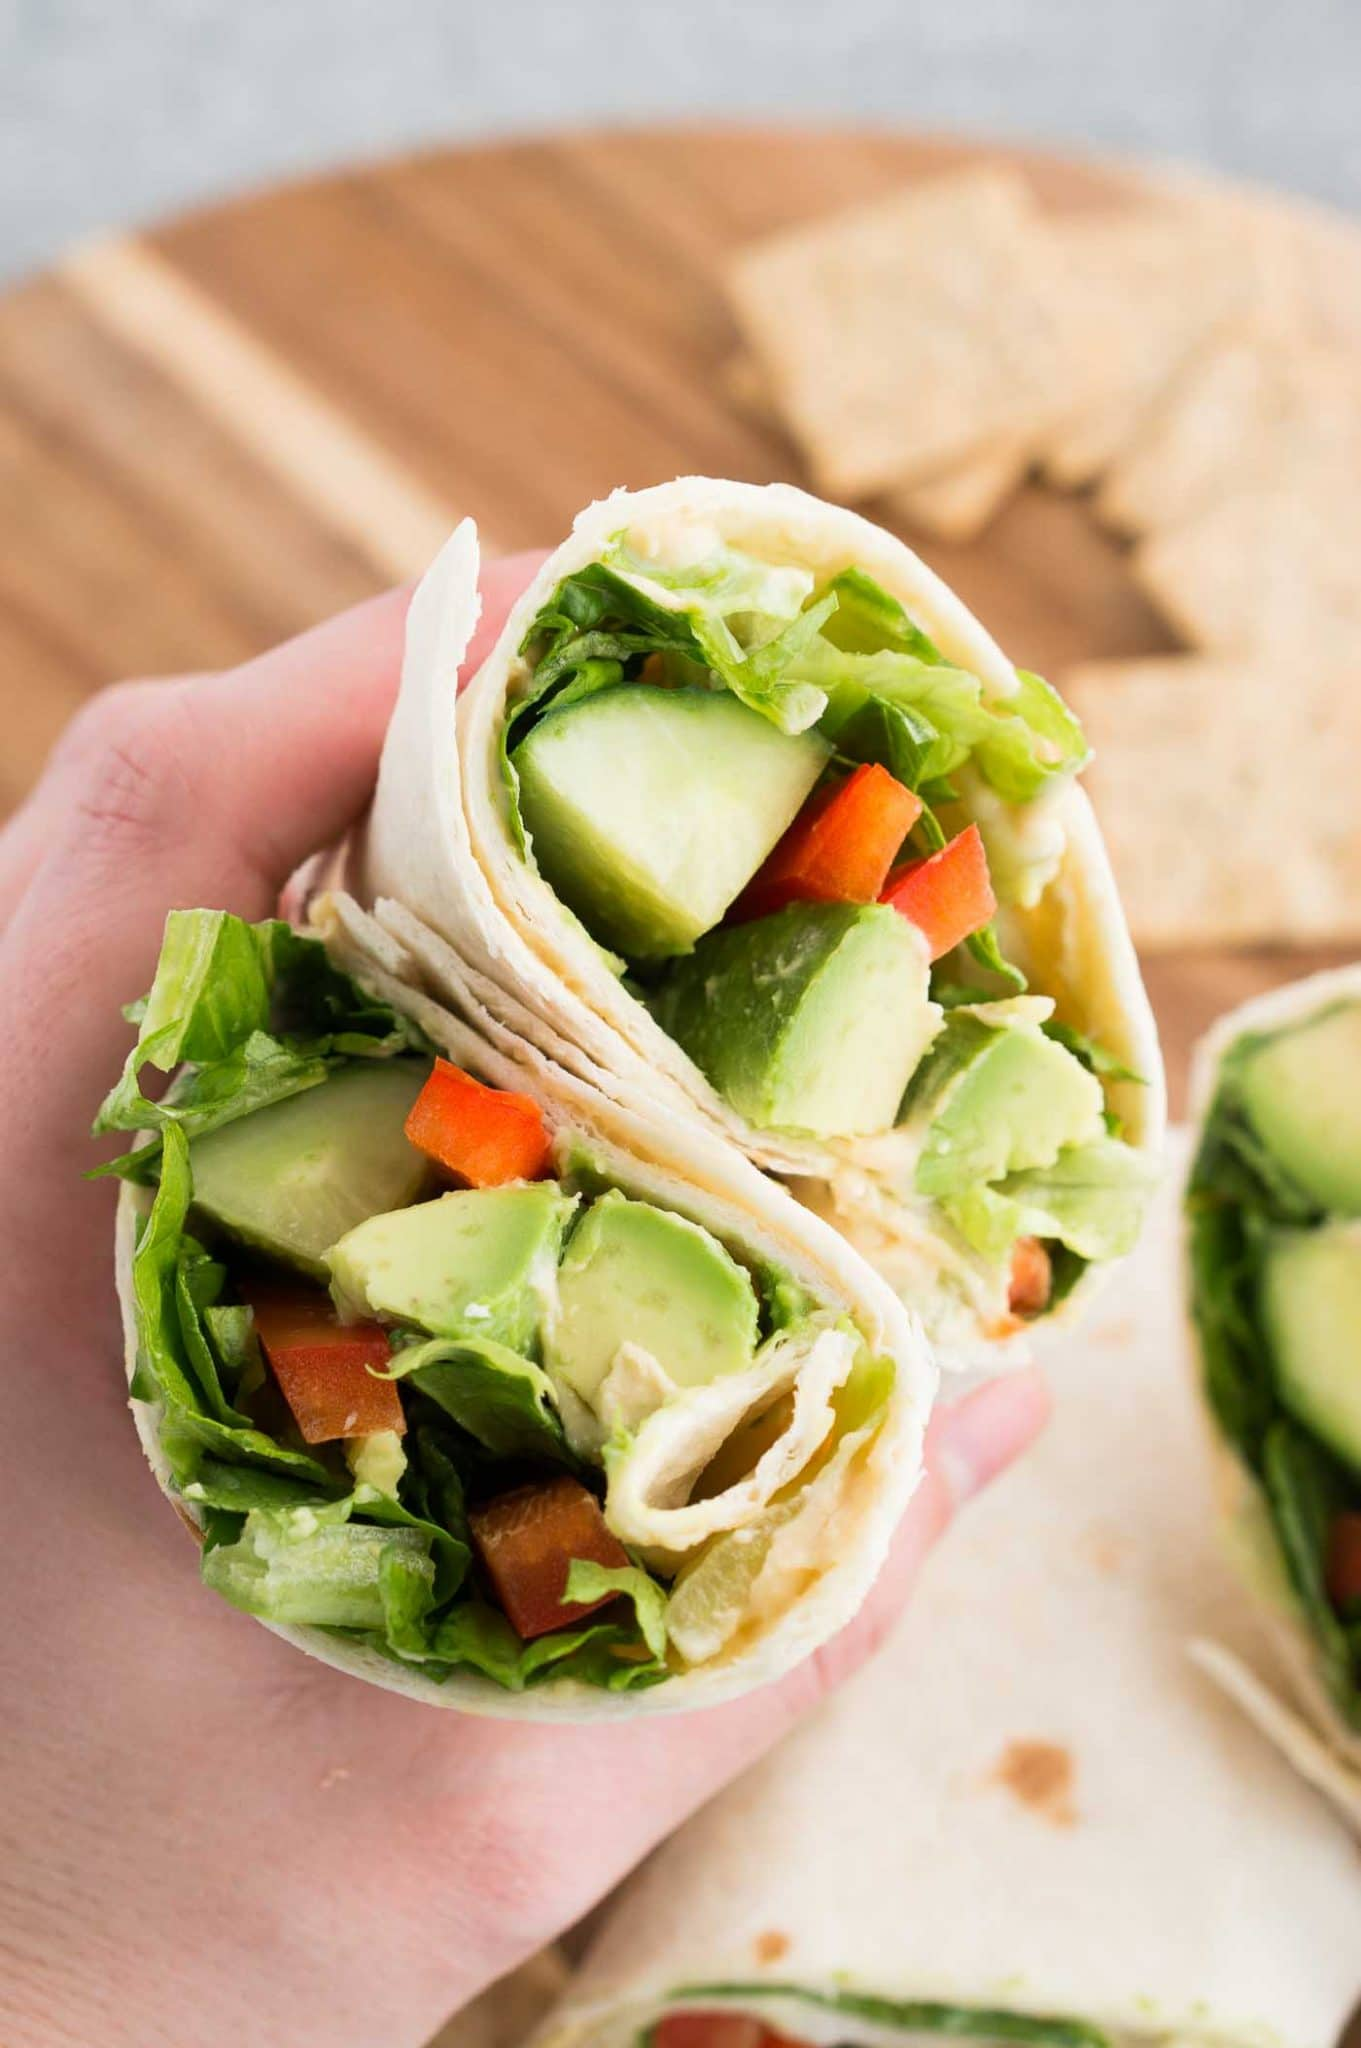 holding a vegan wrap sliced in half